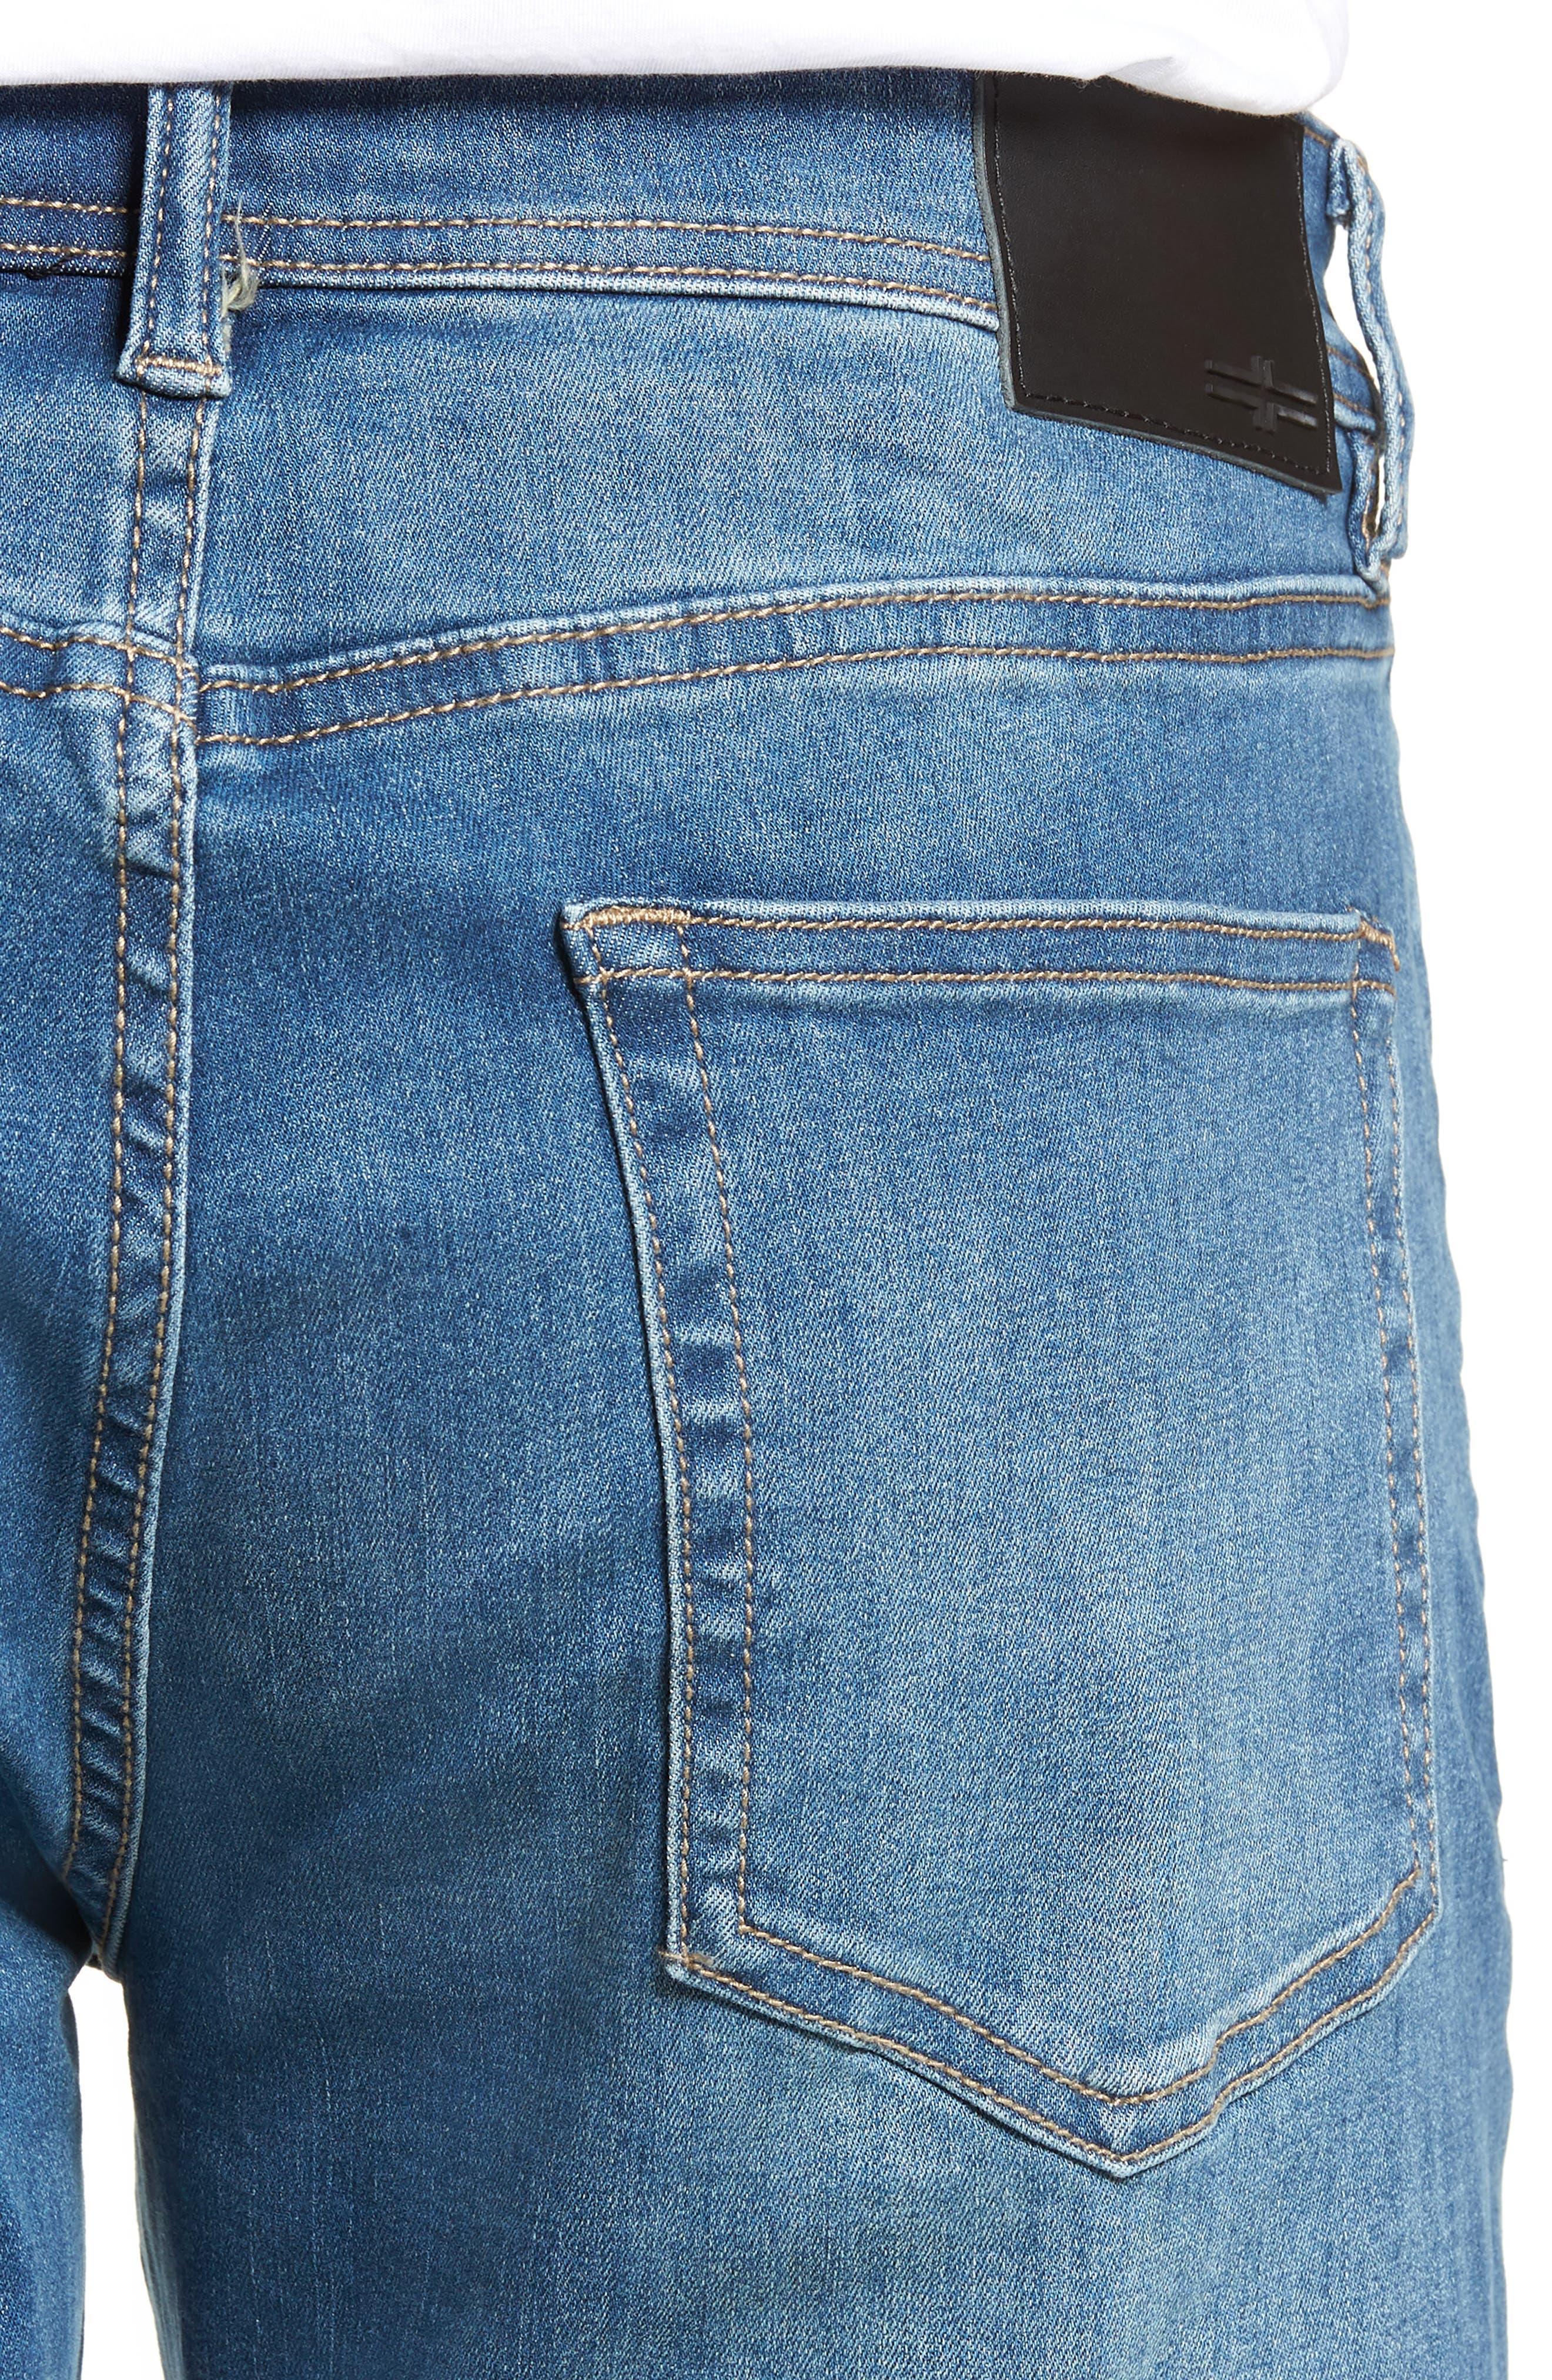 Regent Relaxed Straight Leg Jeans,                             Alternate thumbnail 4, color,                             LORAIN